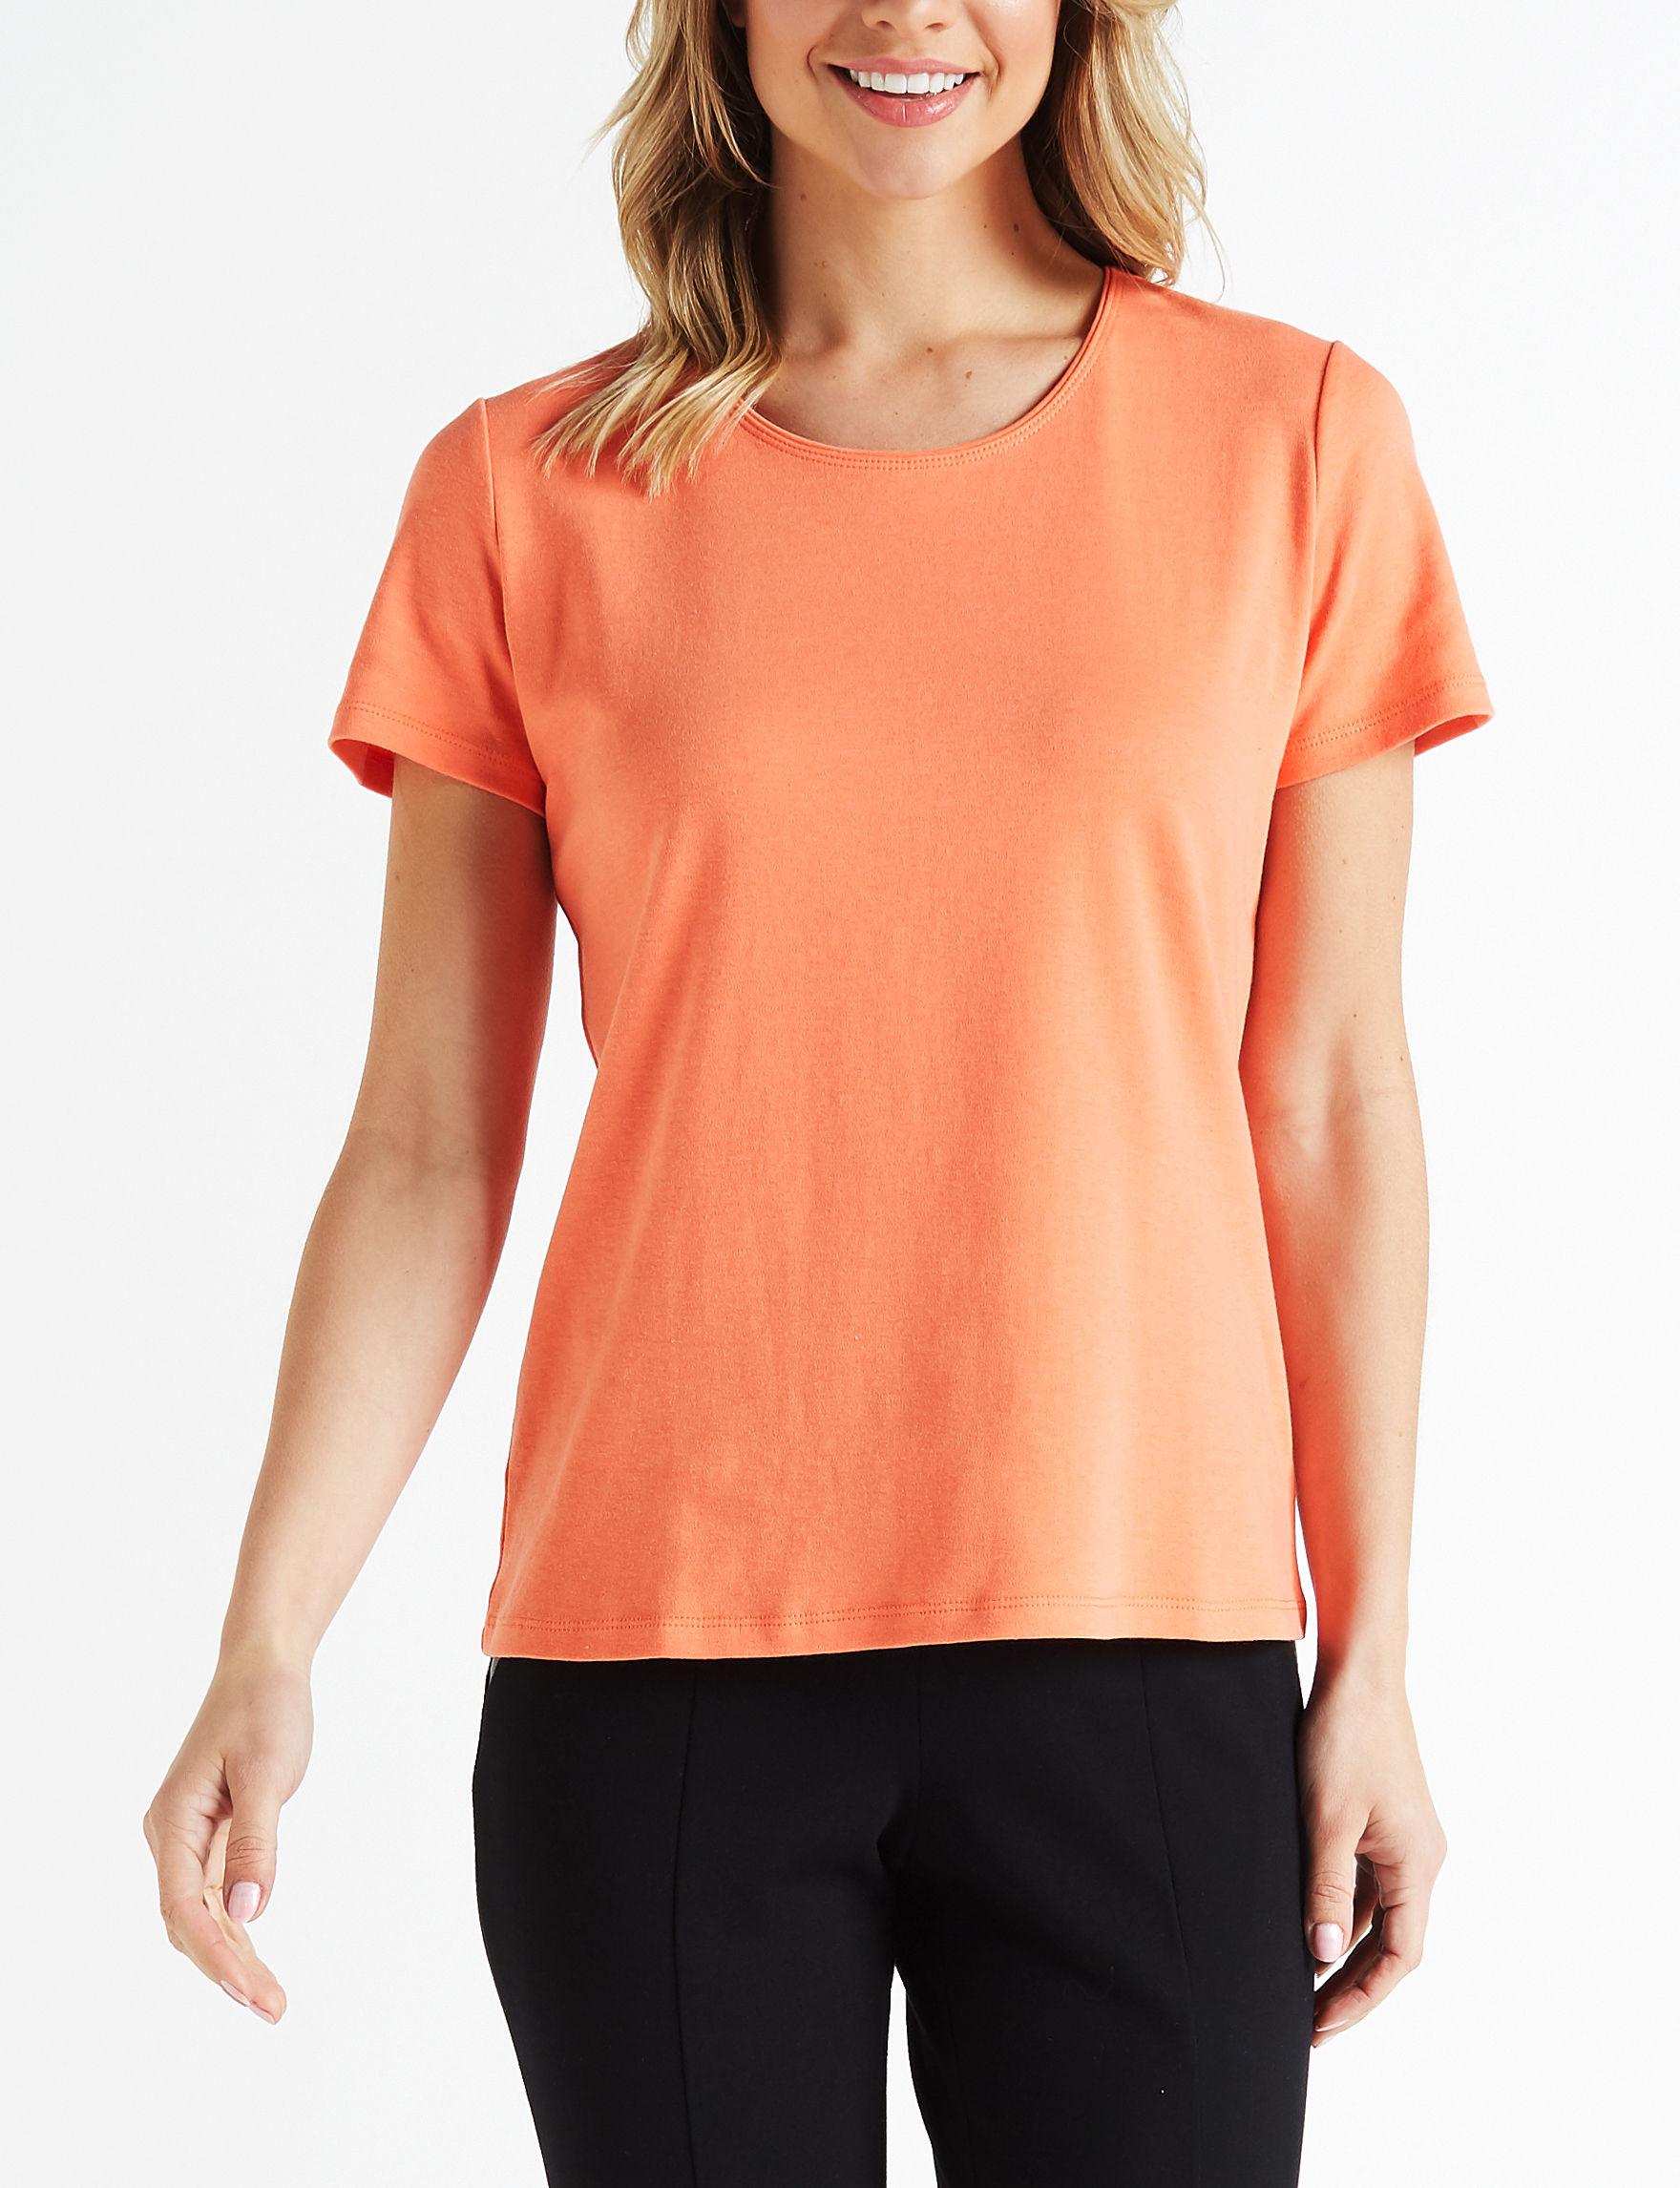 Rebecca Malone Orange Shirts & Blouses Tees & Tanks